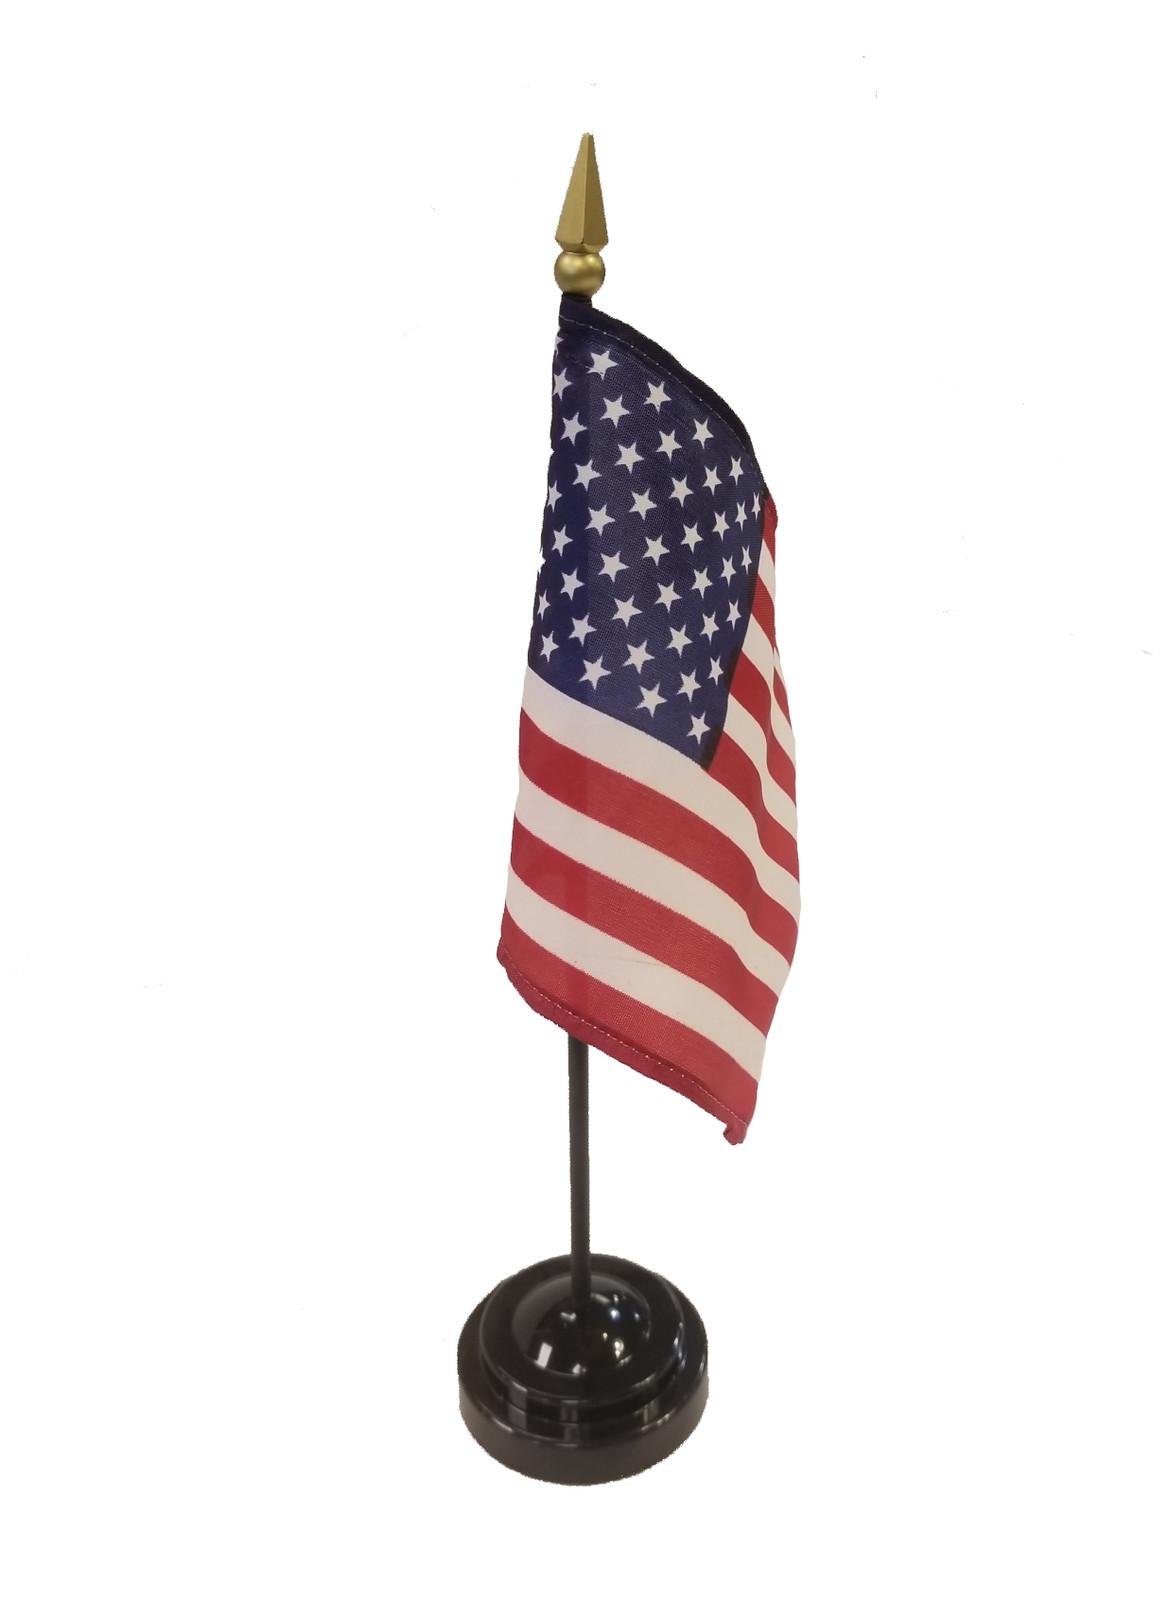 American Tabletop Flag (20190619-02)